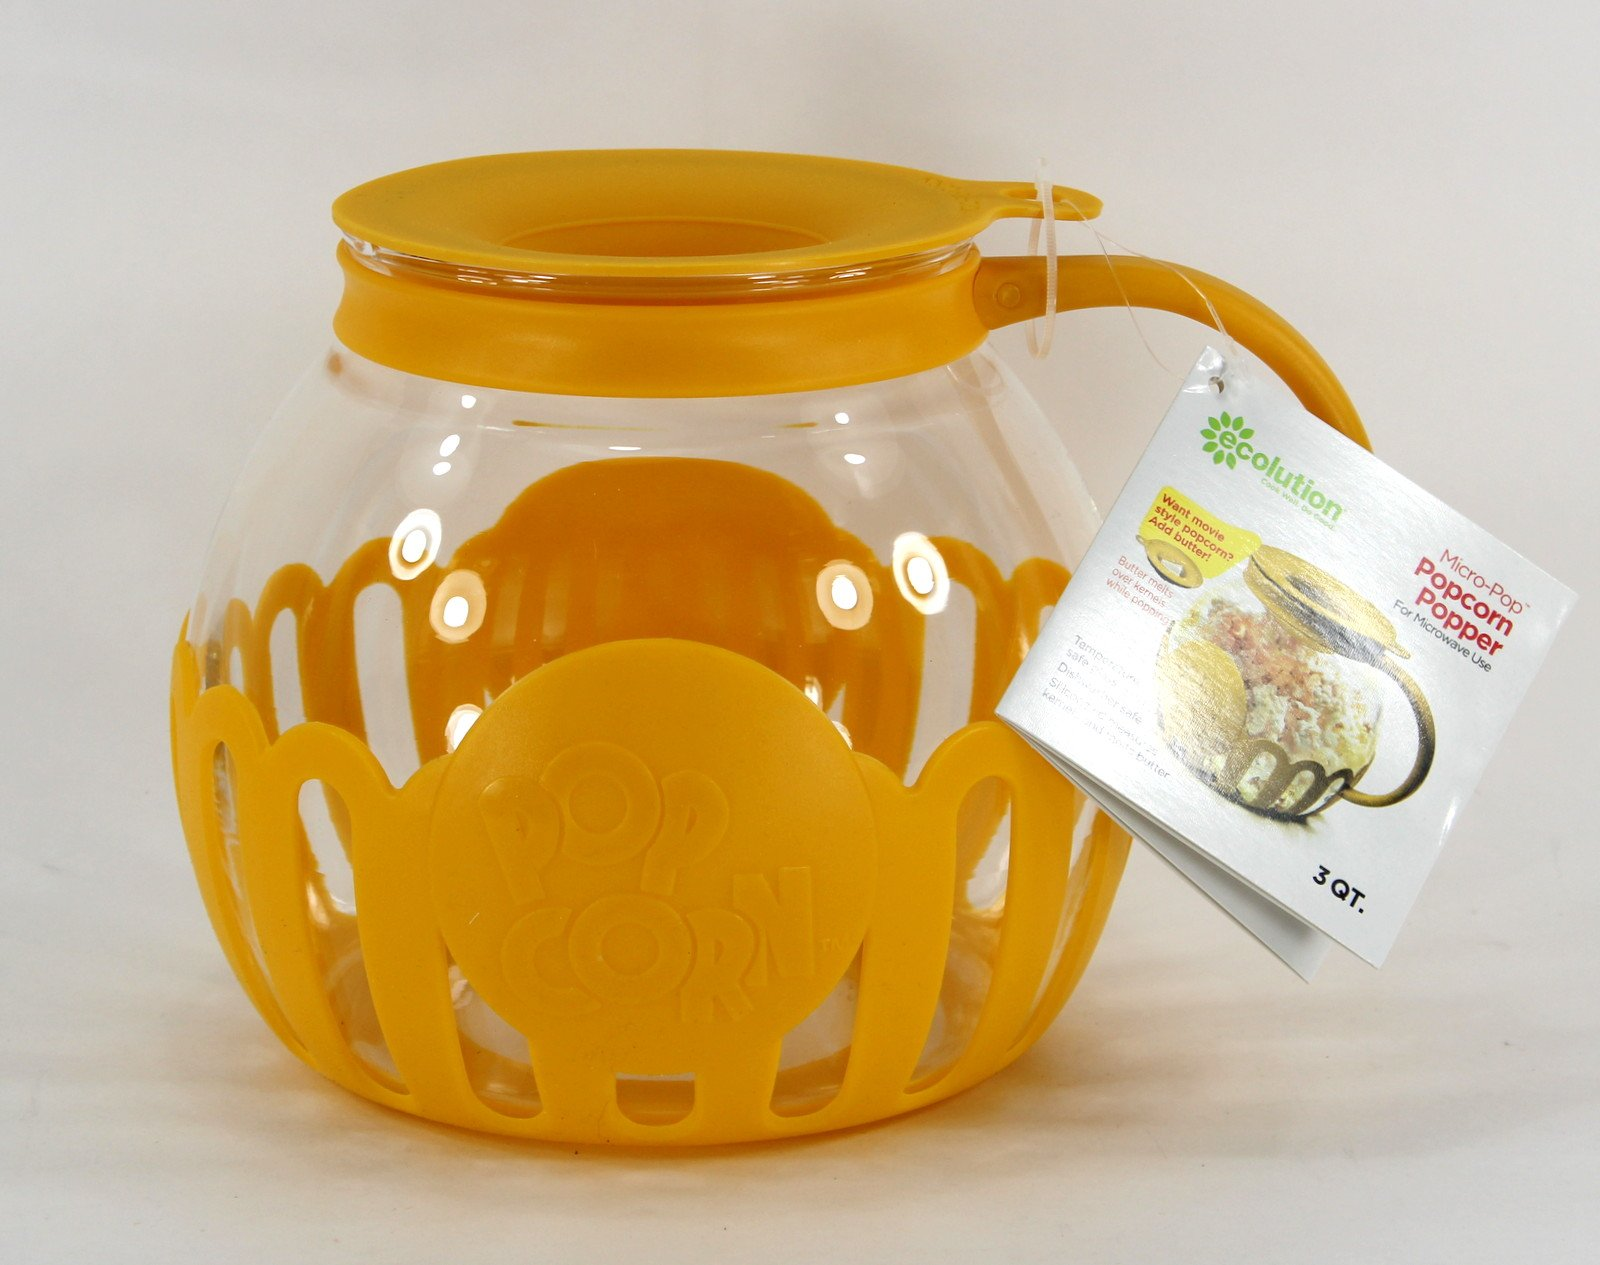 Ecolution Micro-Pop Microwave Popcorn Popper 3QT - Temperature Safe Glass w/Multi Purpose Lid (Large, Yellow)